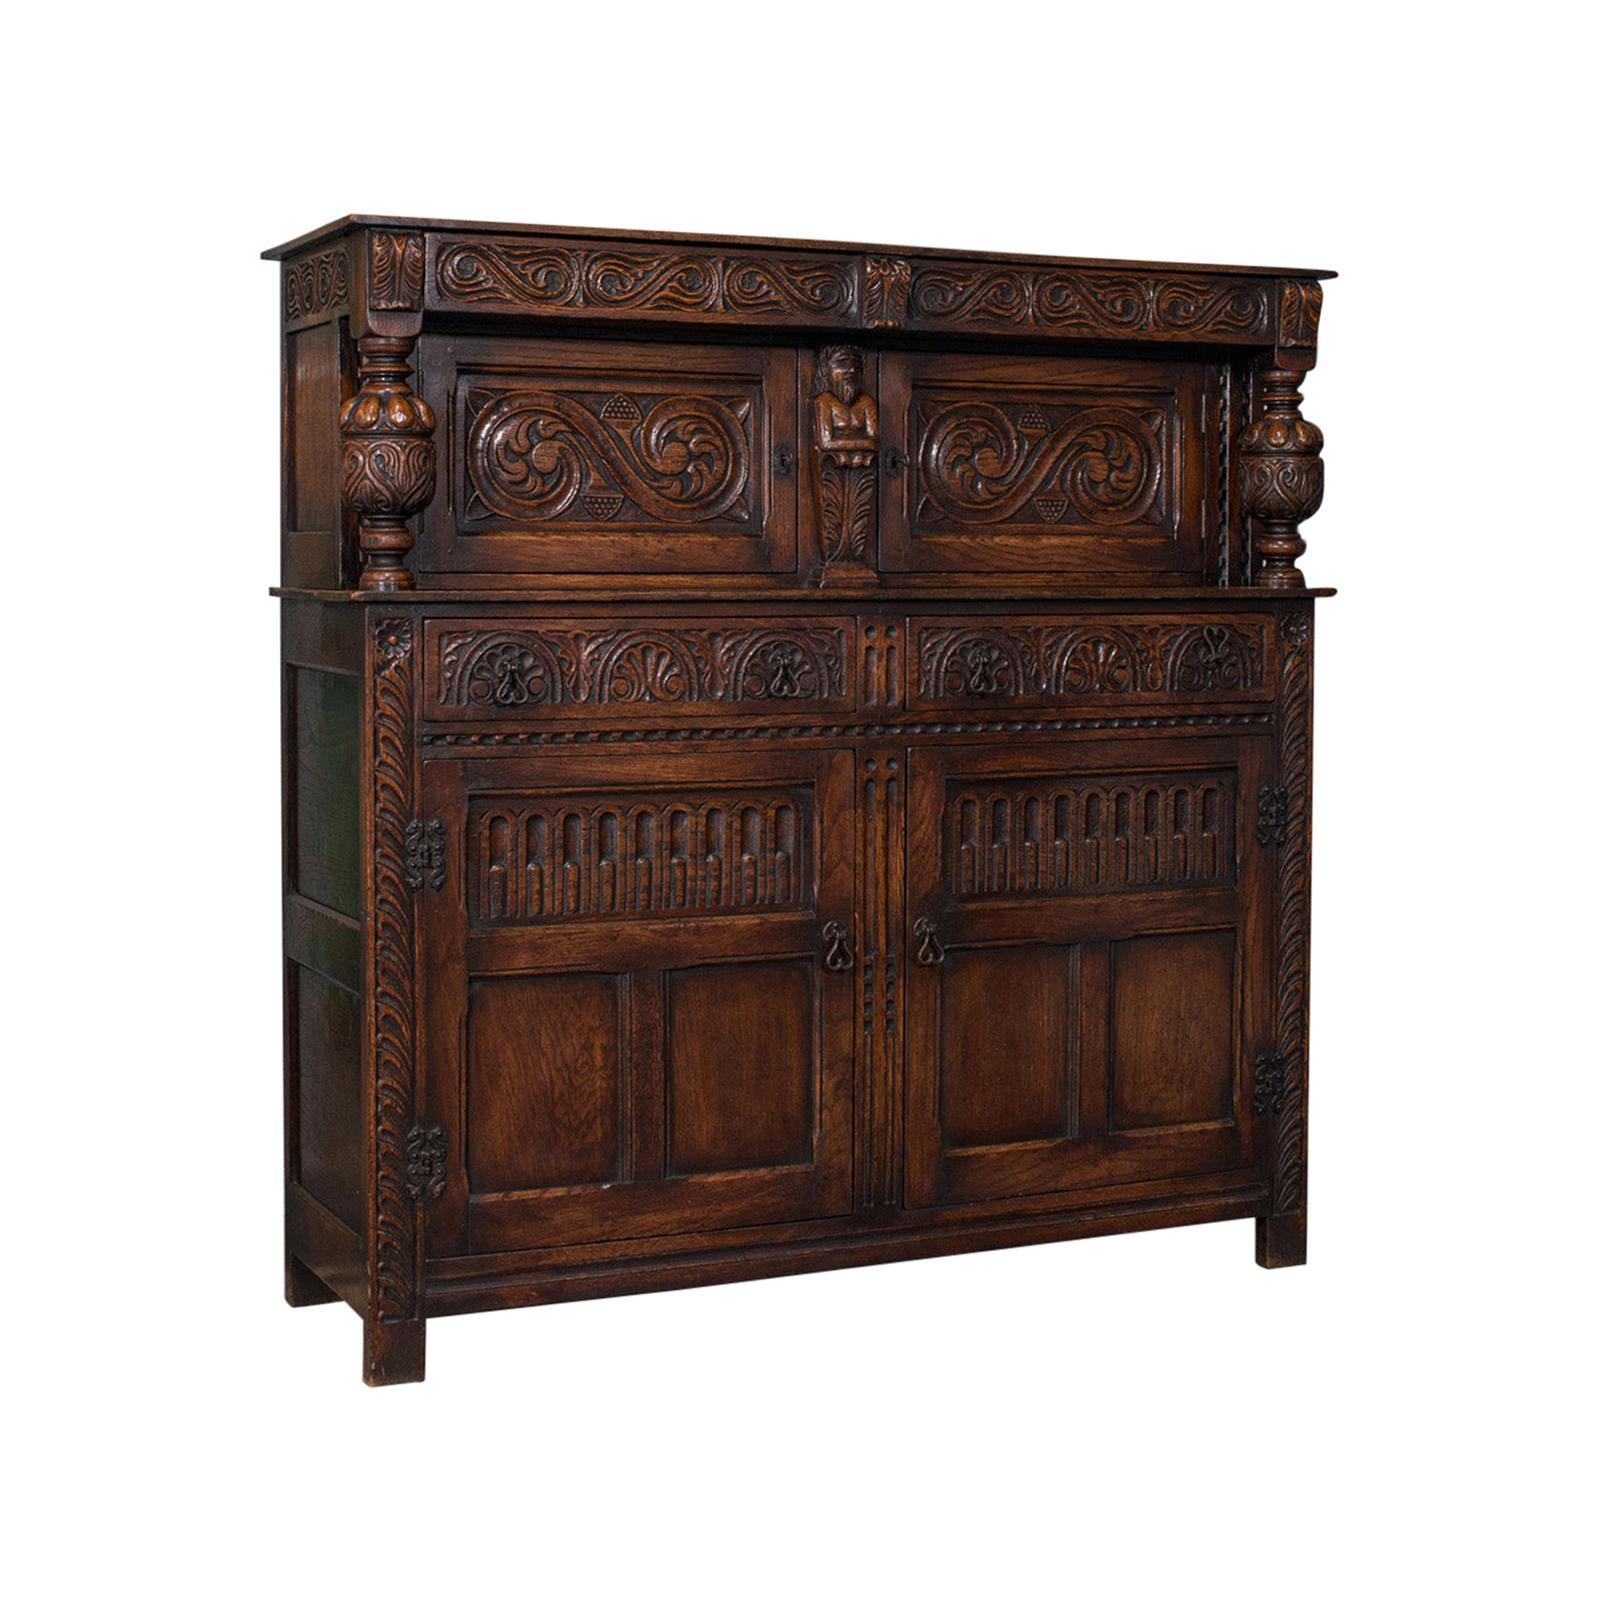 Antique Court Cabinet, English, Oak, Sideboard, Credenza, Jacobean Revival, 1890